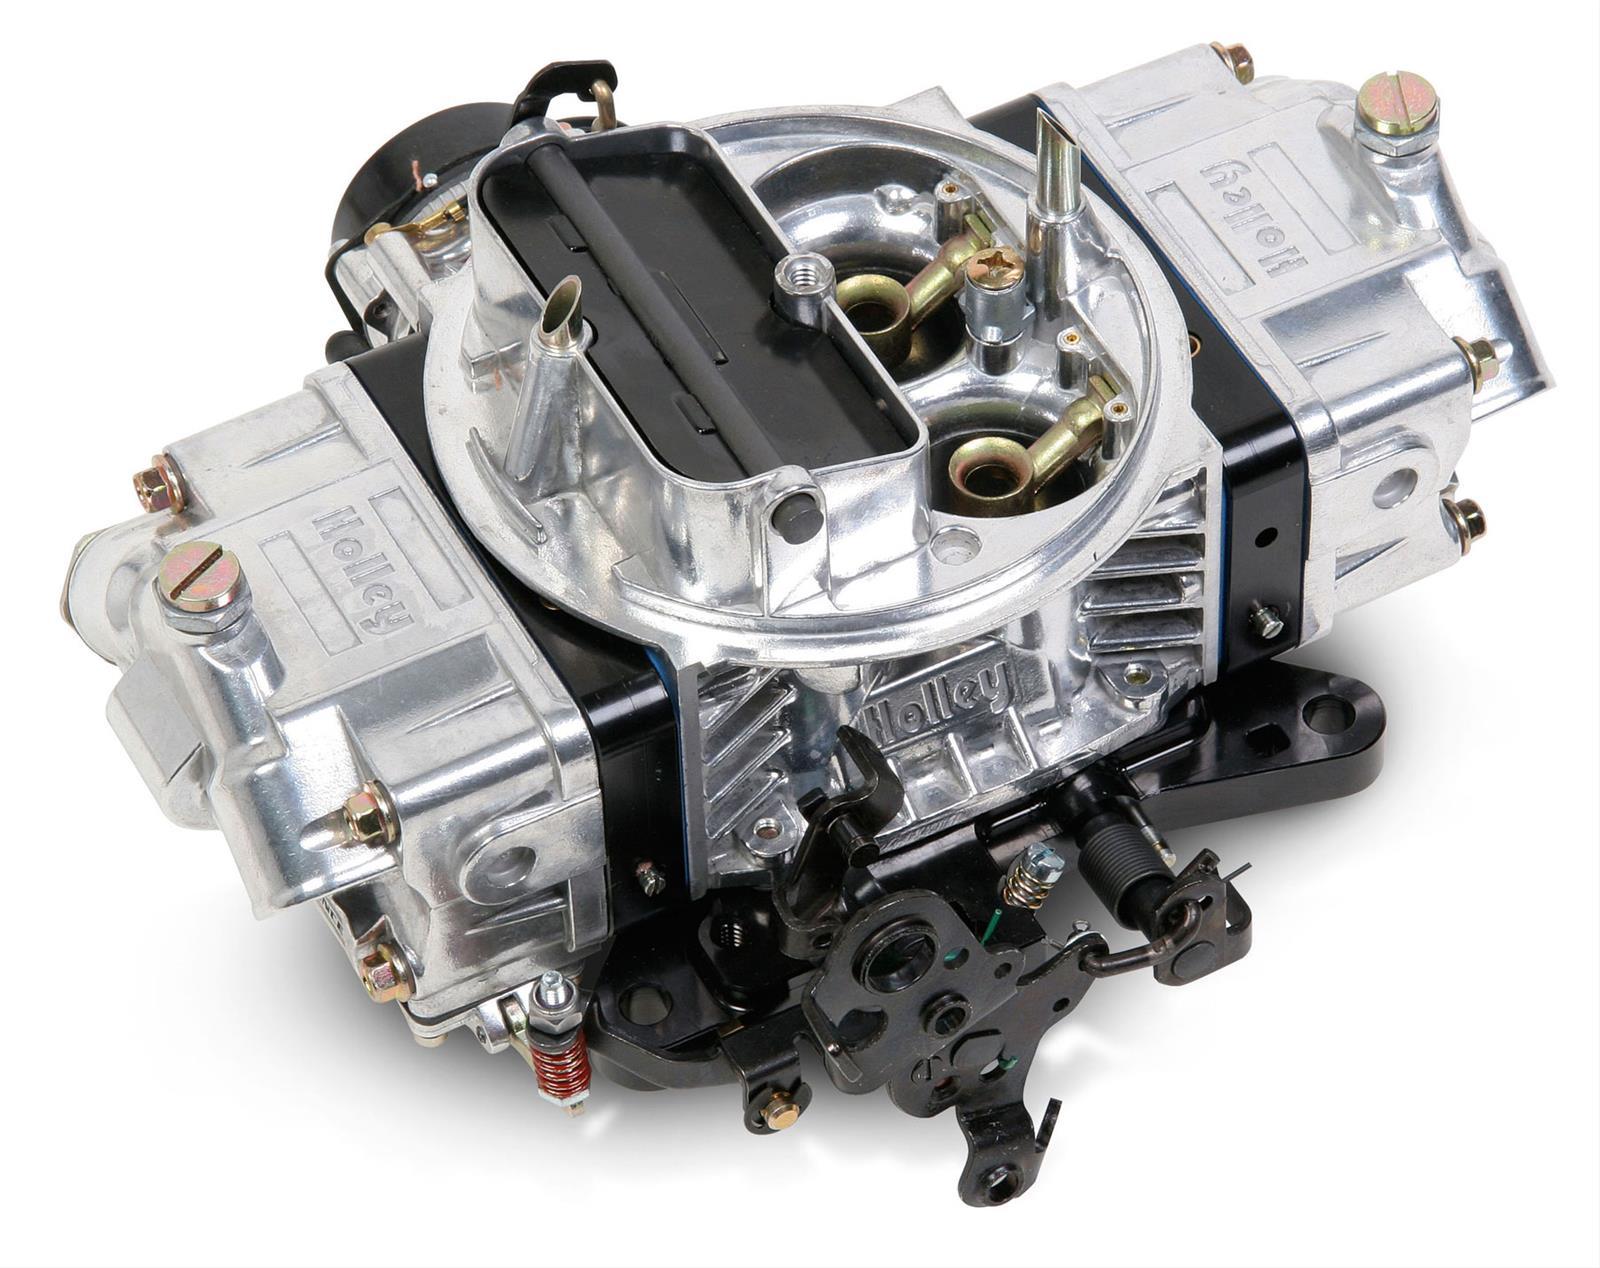 Mighty Max Wiring Diagram Holley Ultra Double Pumper Carburetors 0 76750bk Free